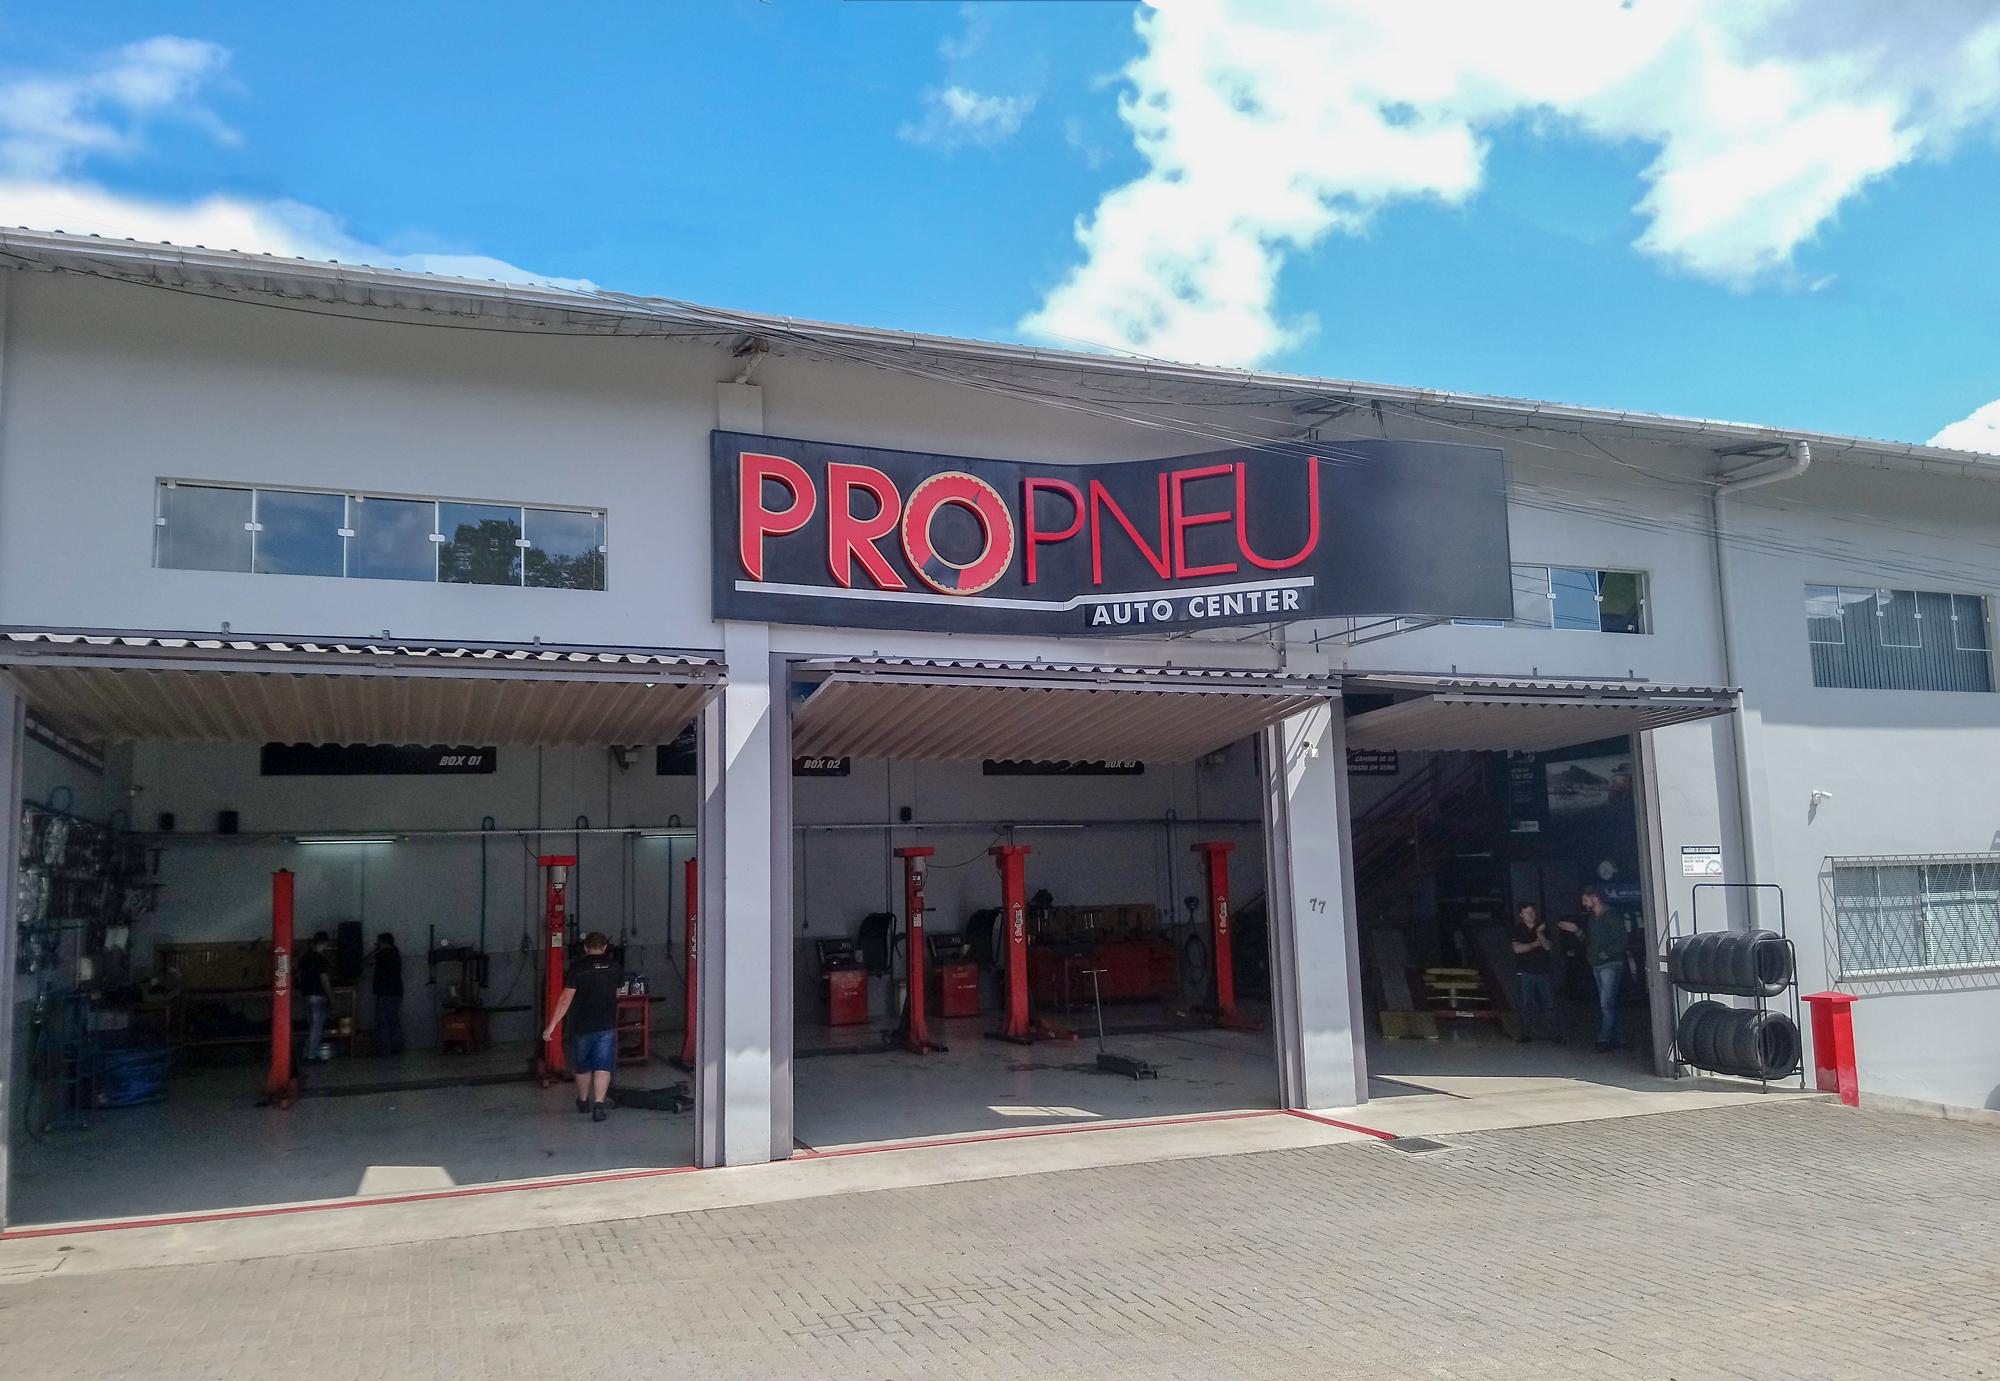 Auto Center Pro Pneu